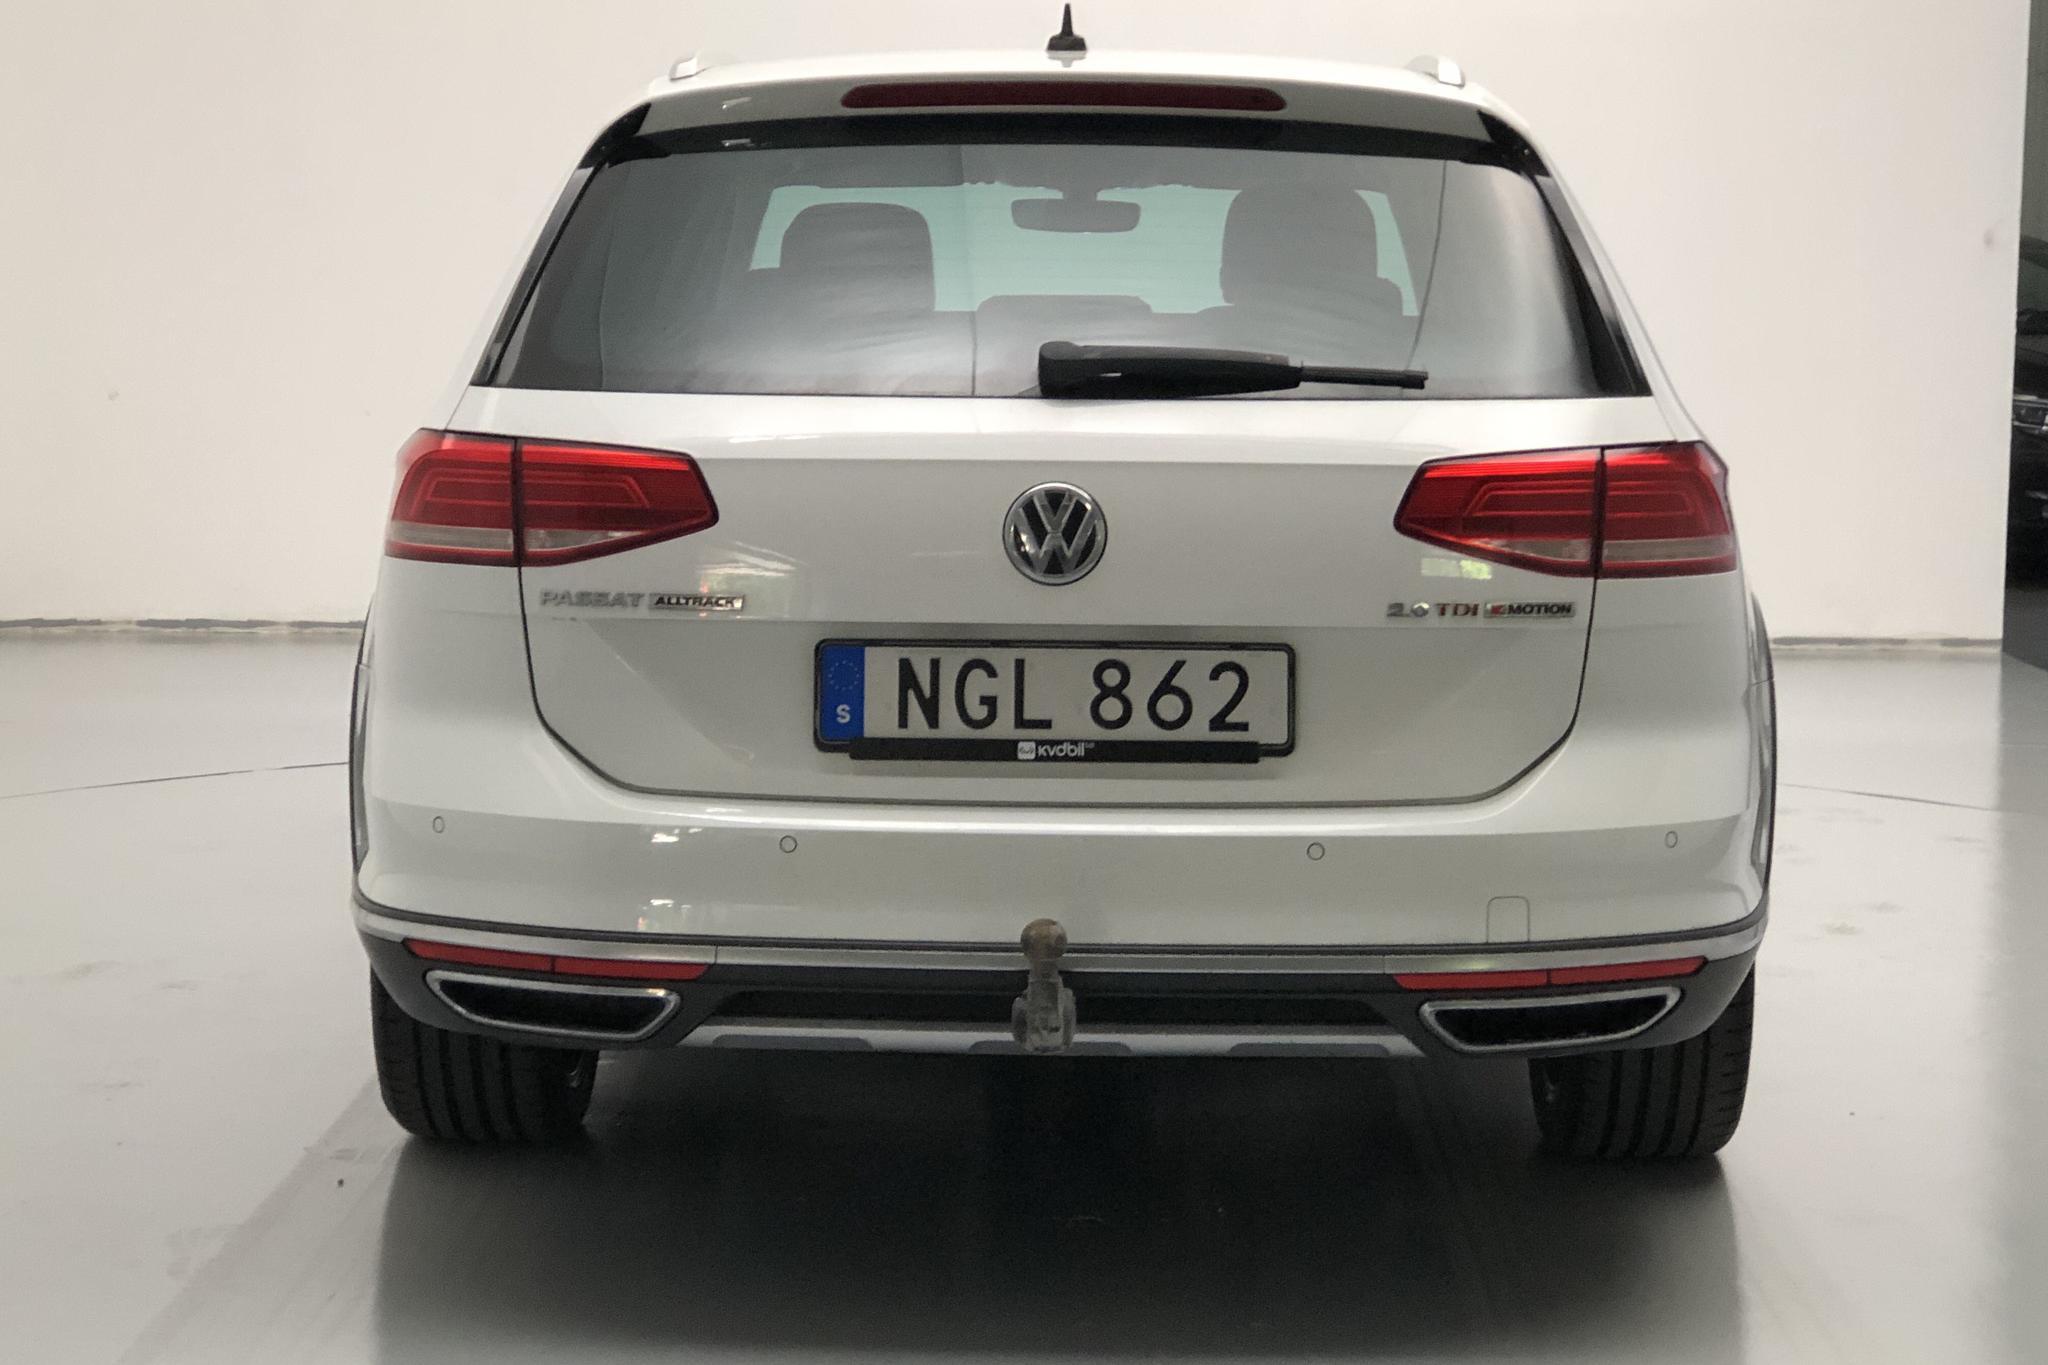 VW Passat Alltrack 2.0 TDI Sportscombi 4MOTION (240hk) - 83 740 km - Automatic - white - 2016